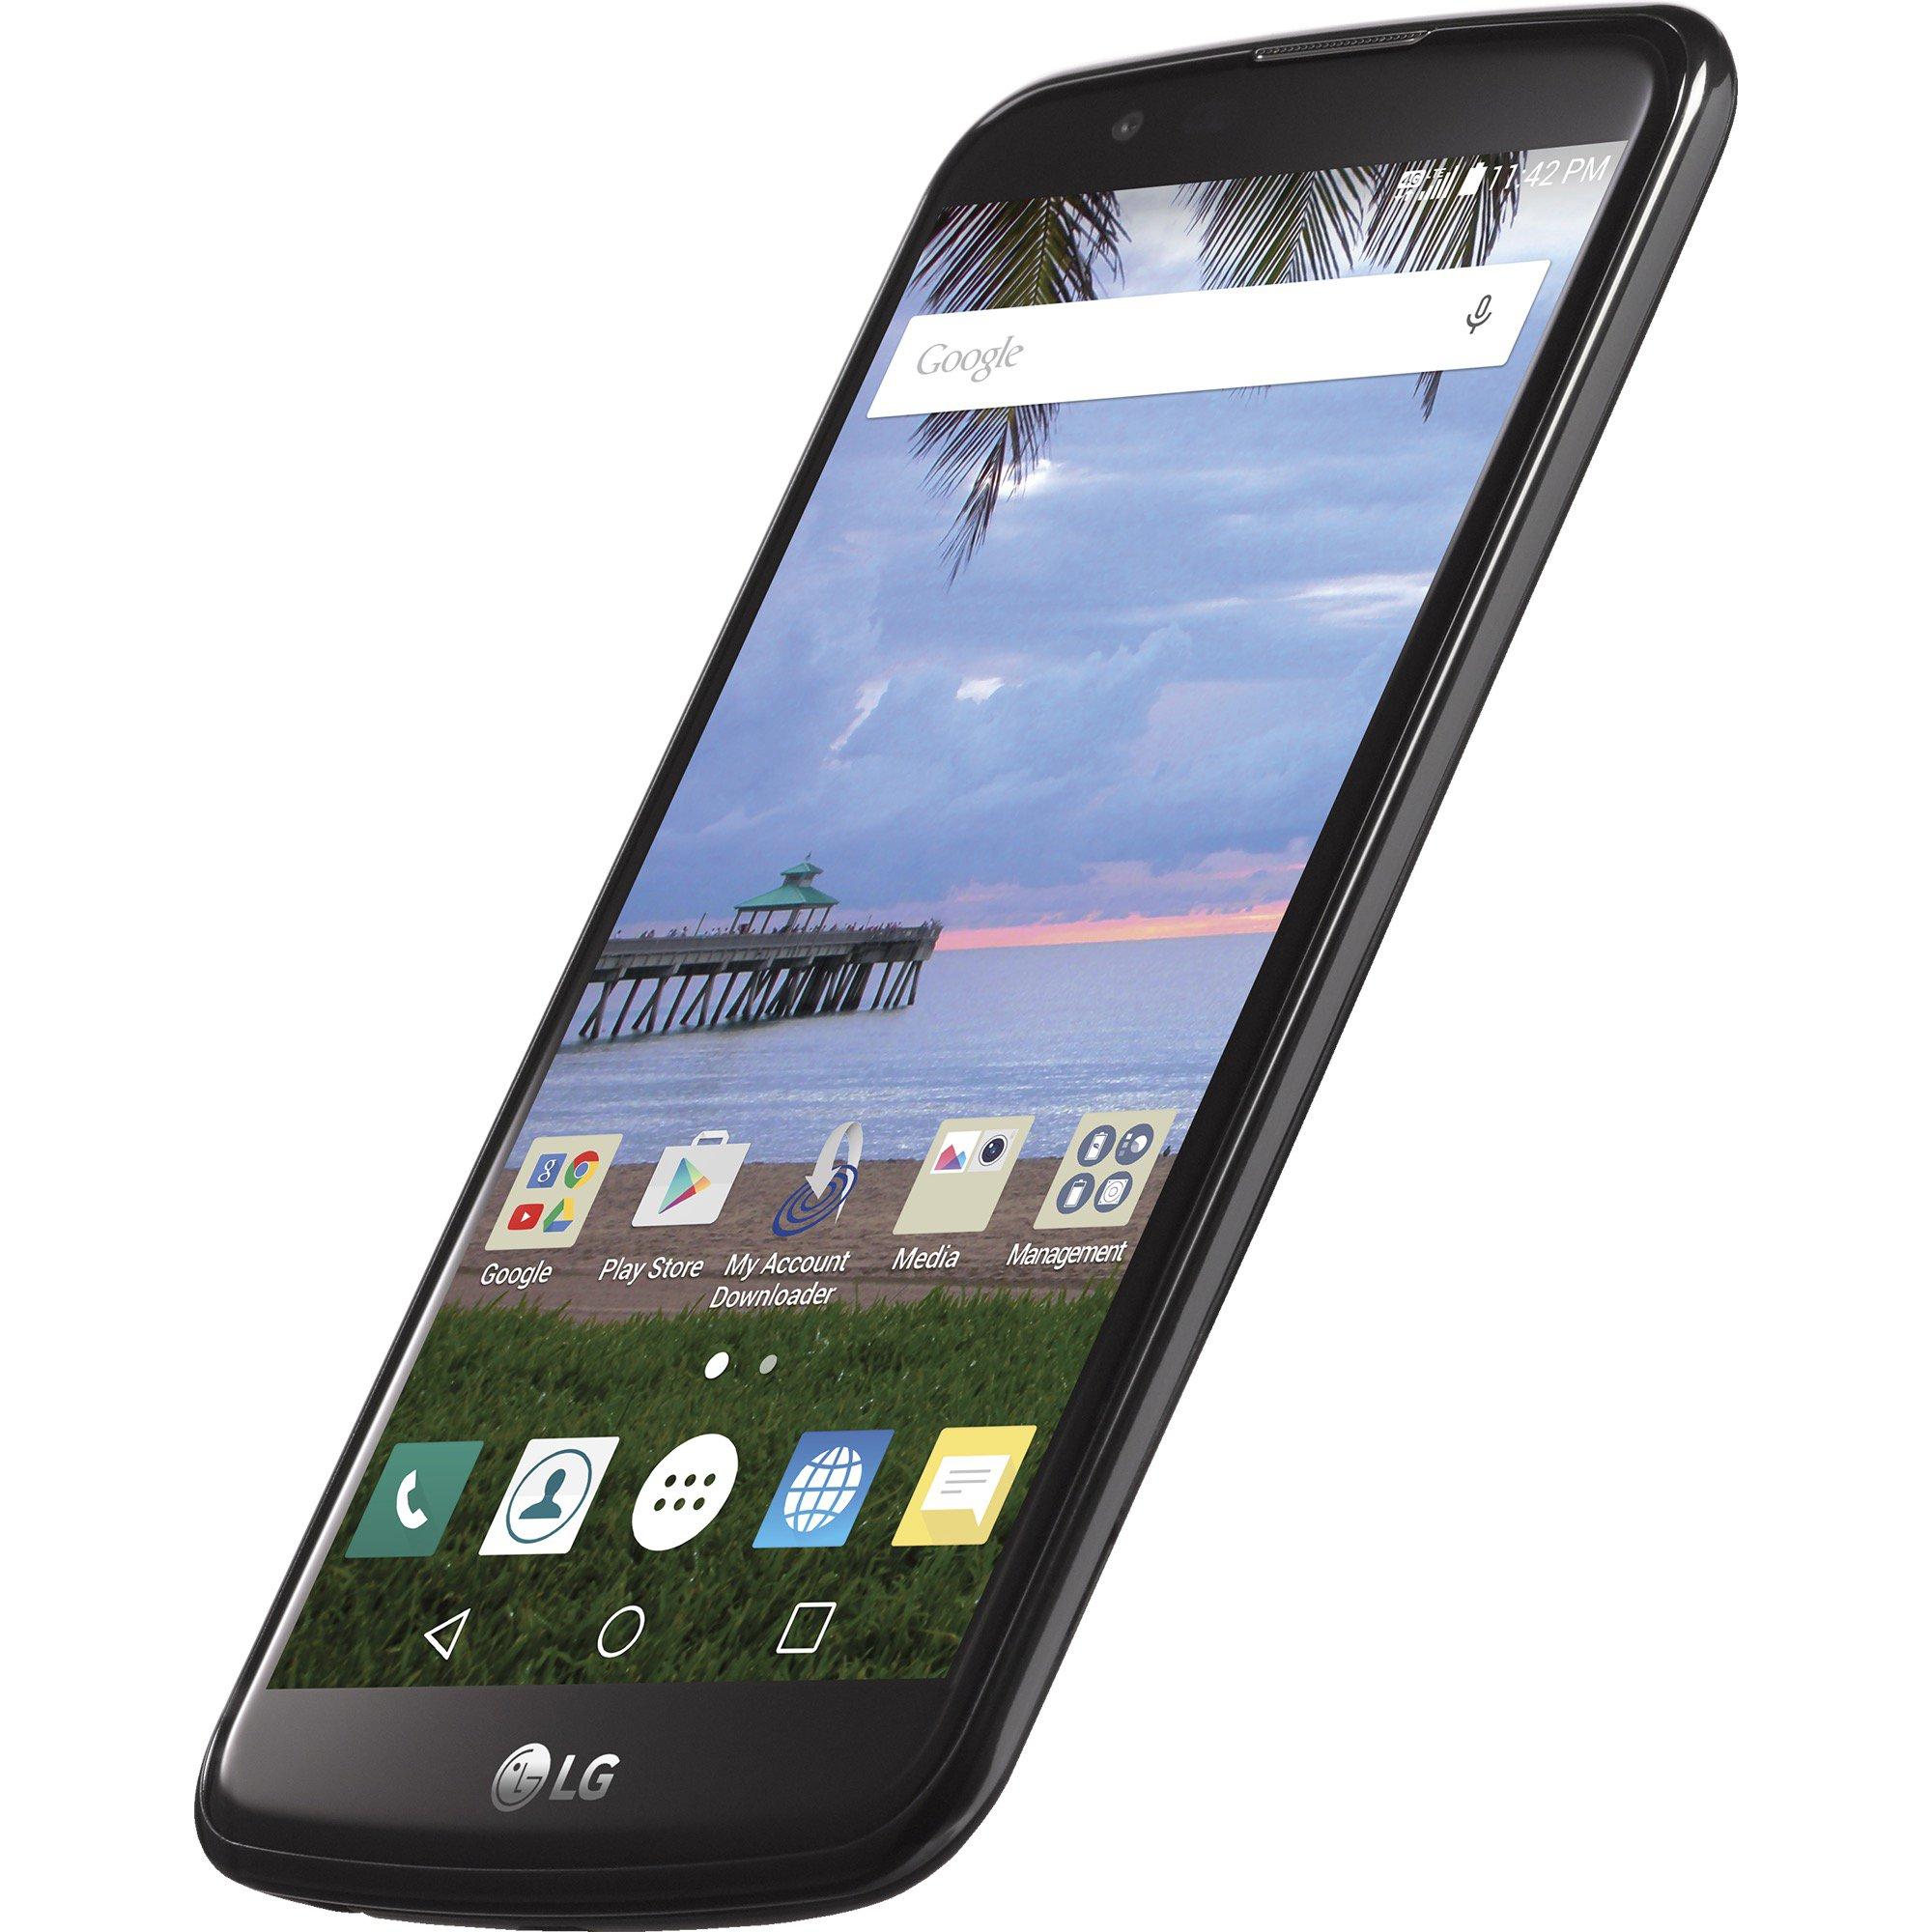 TracFone LG Premier 4G LTE CDMA Prepaid Smartphone by TracFone (Image #4)